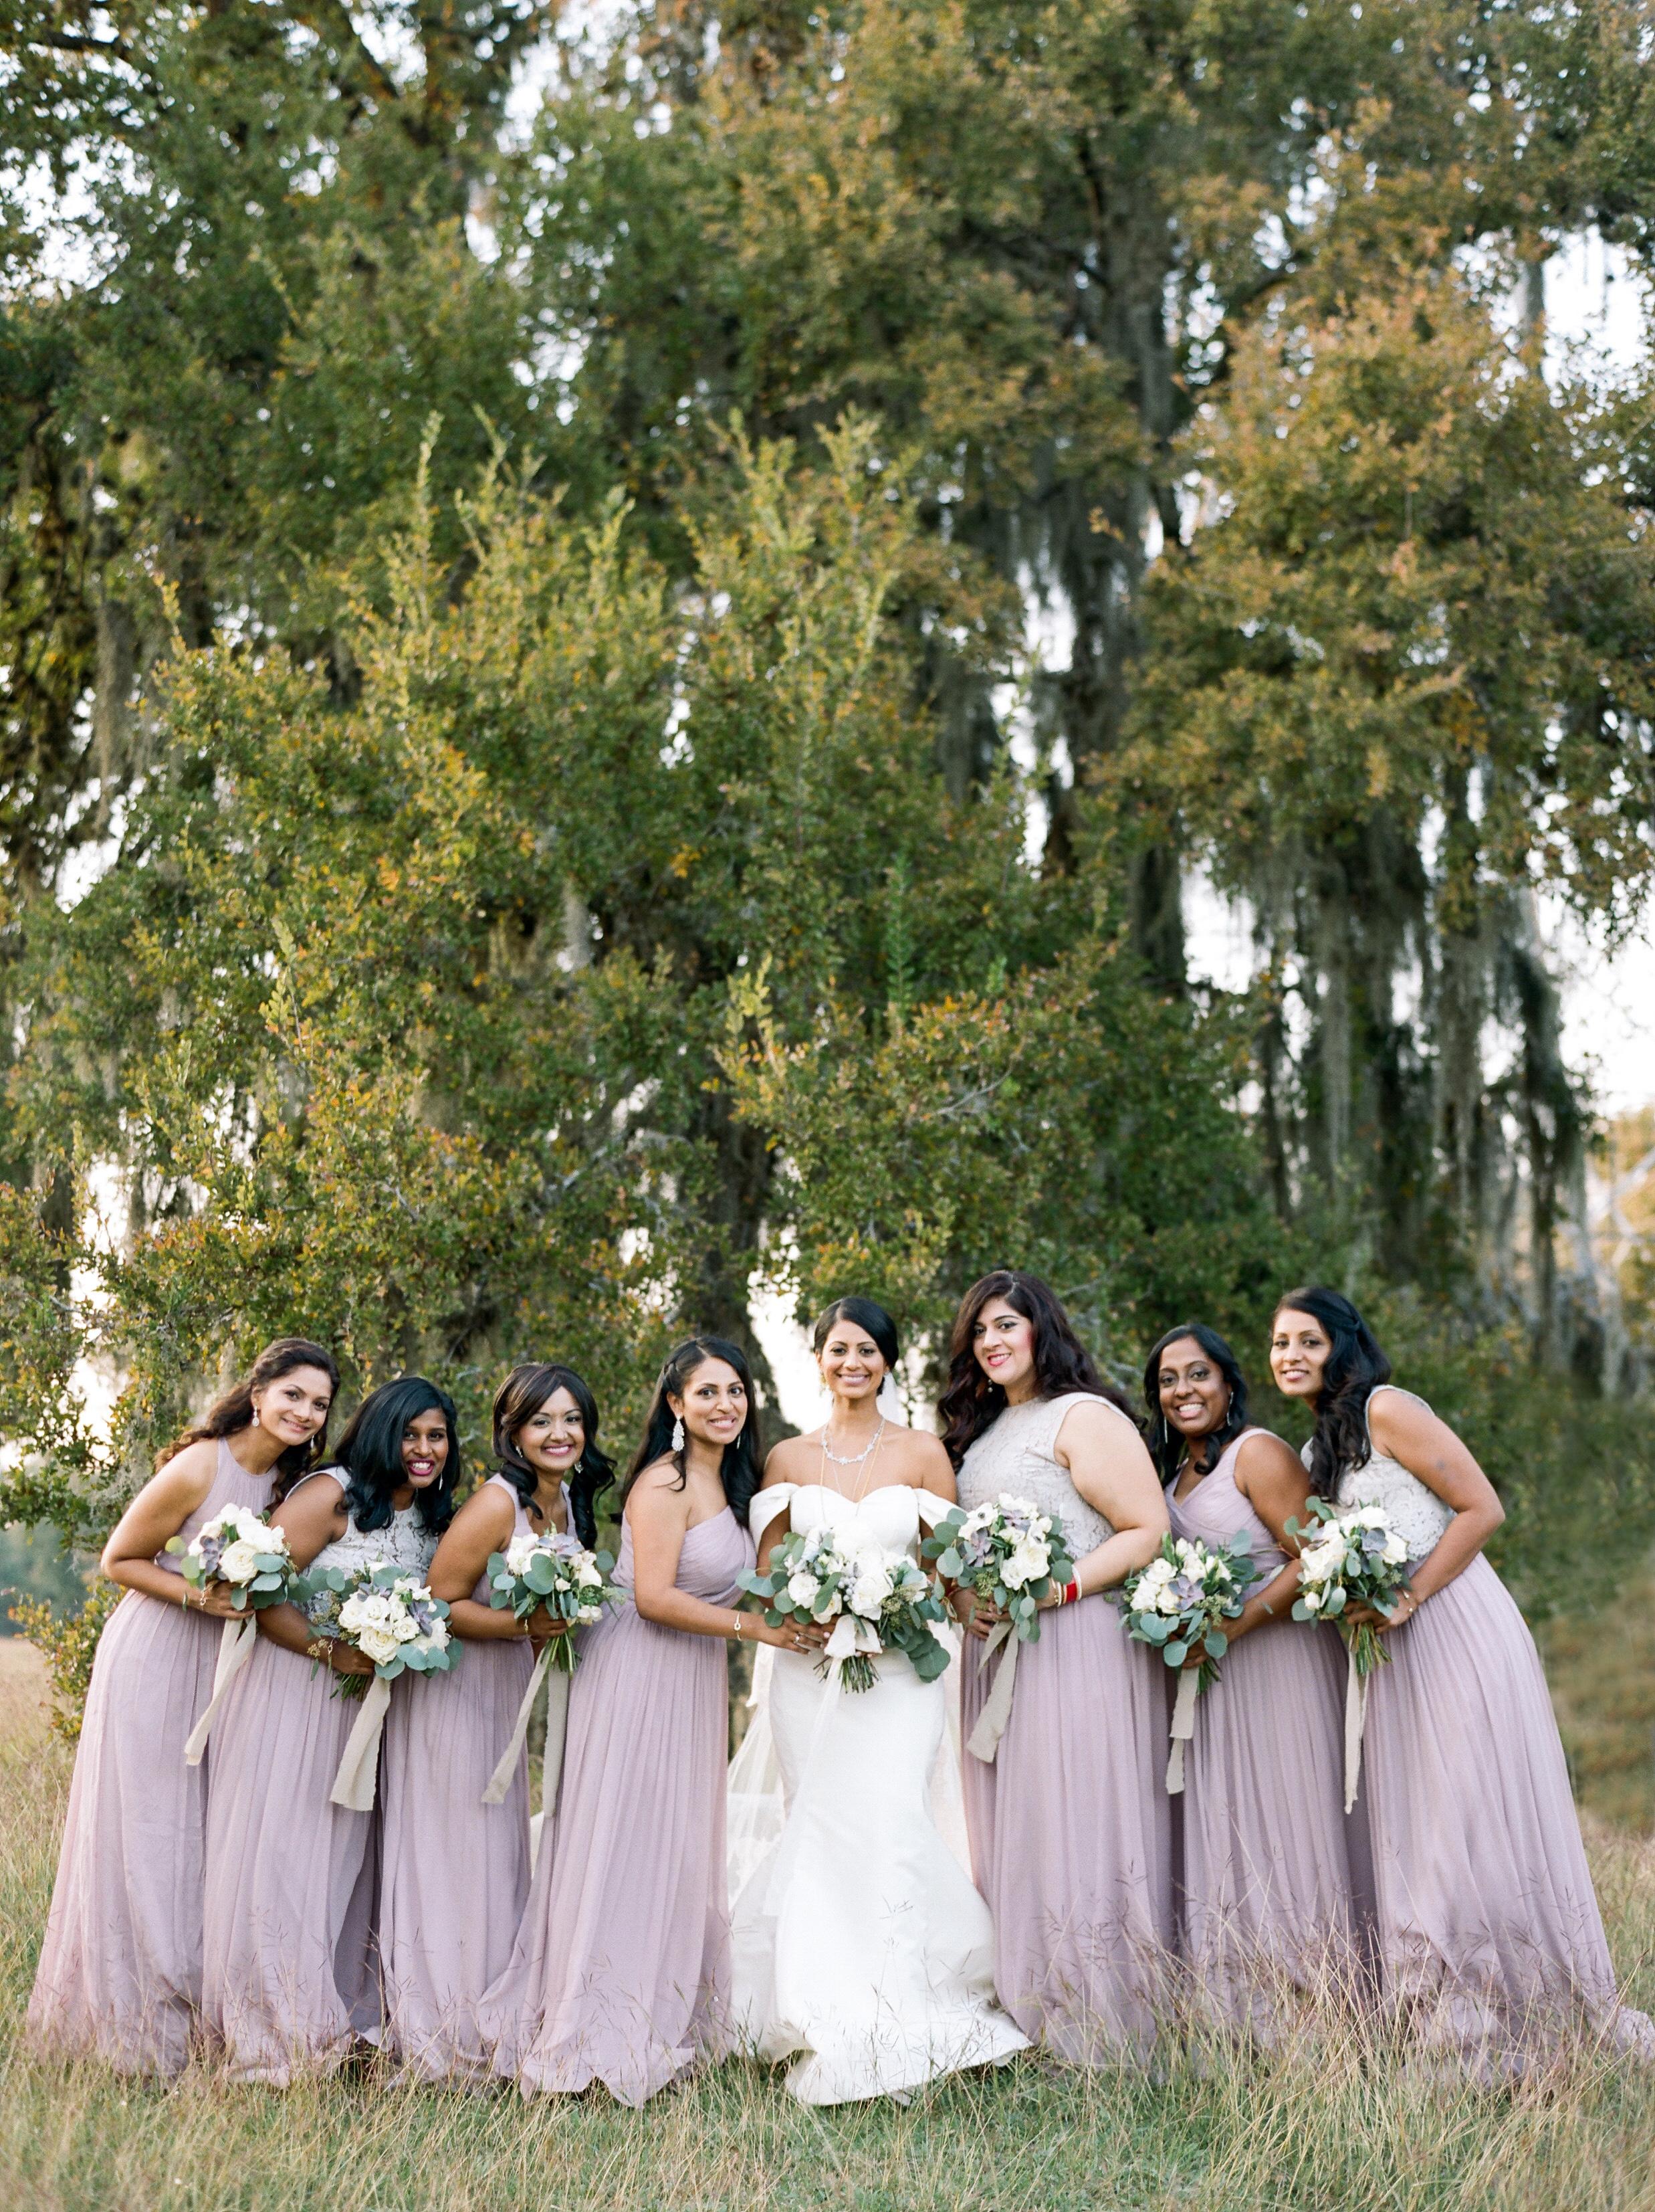 Fine-Art-Film-Houston-Wedding-Photographer-Best-Top-Luxury-Texas-Austin-Dallas-Destination-Dana-Fernandez-Photography-The-Bell-Tower-on-34th-Indian-22.jpg